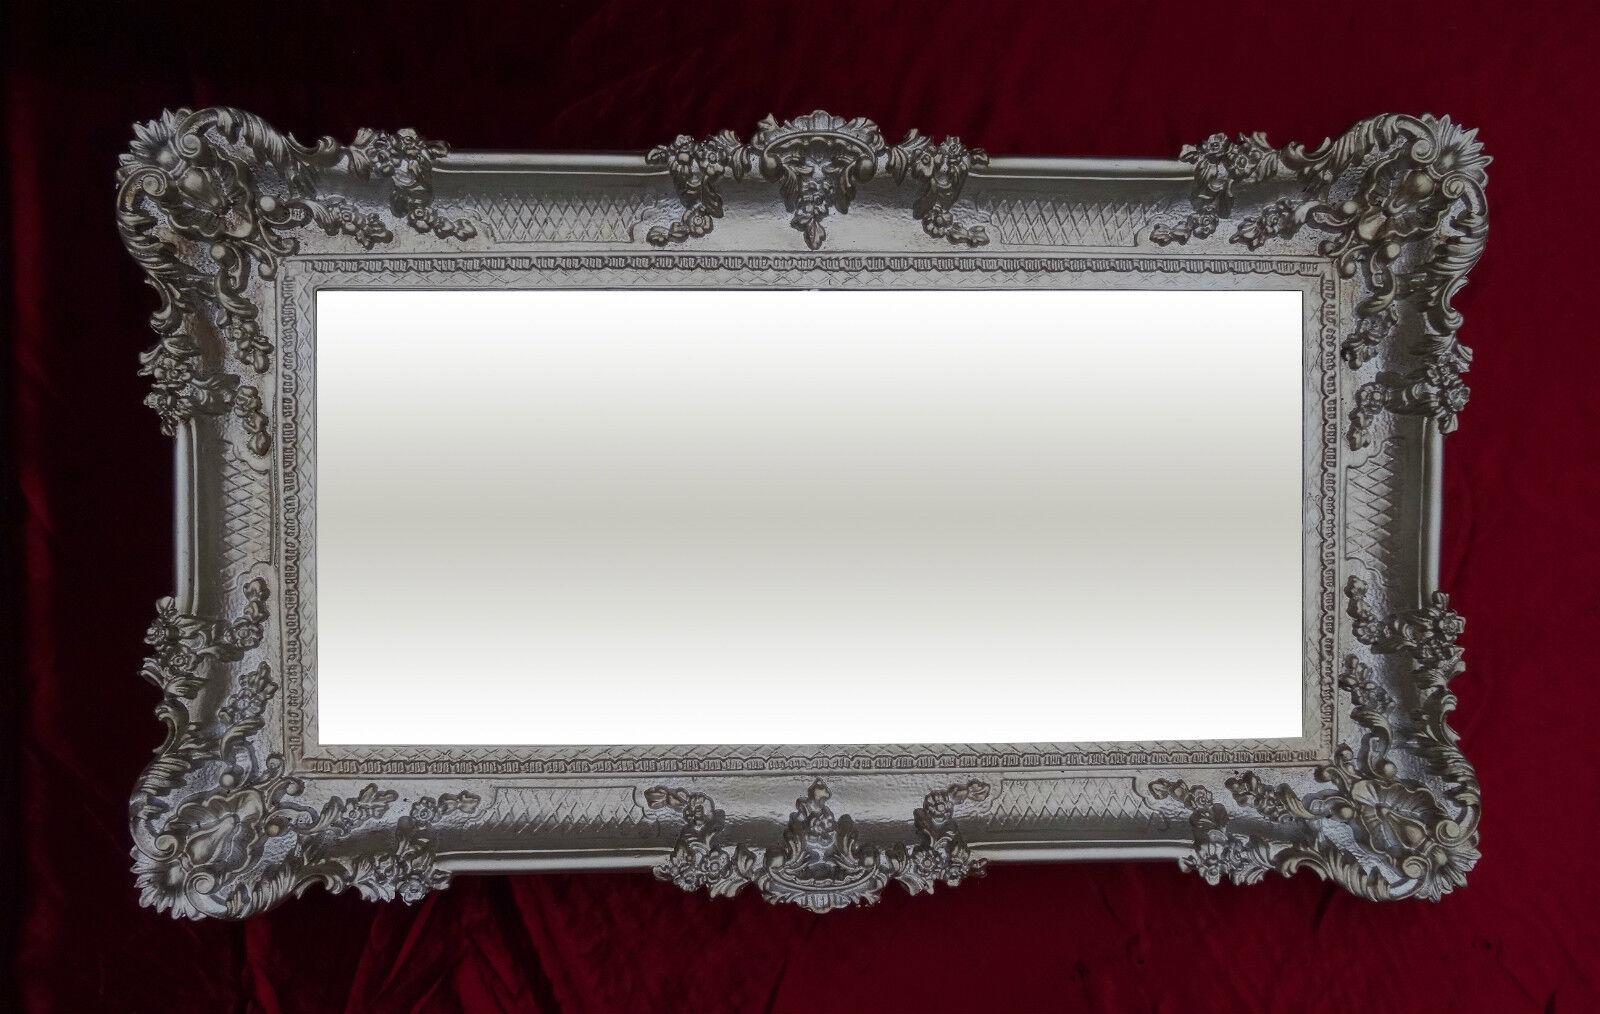 Baroque Miroir Mural luxueux Noir Blanc 96x57 antique miroir rococo luxueux Mural miroir de salle 188120